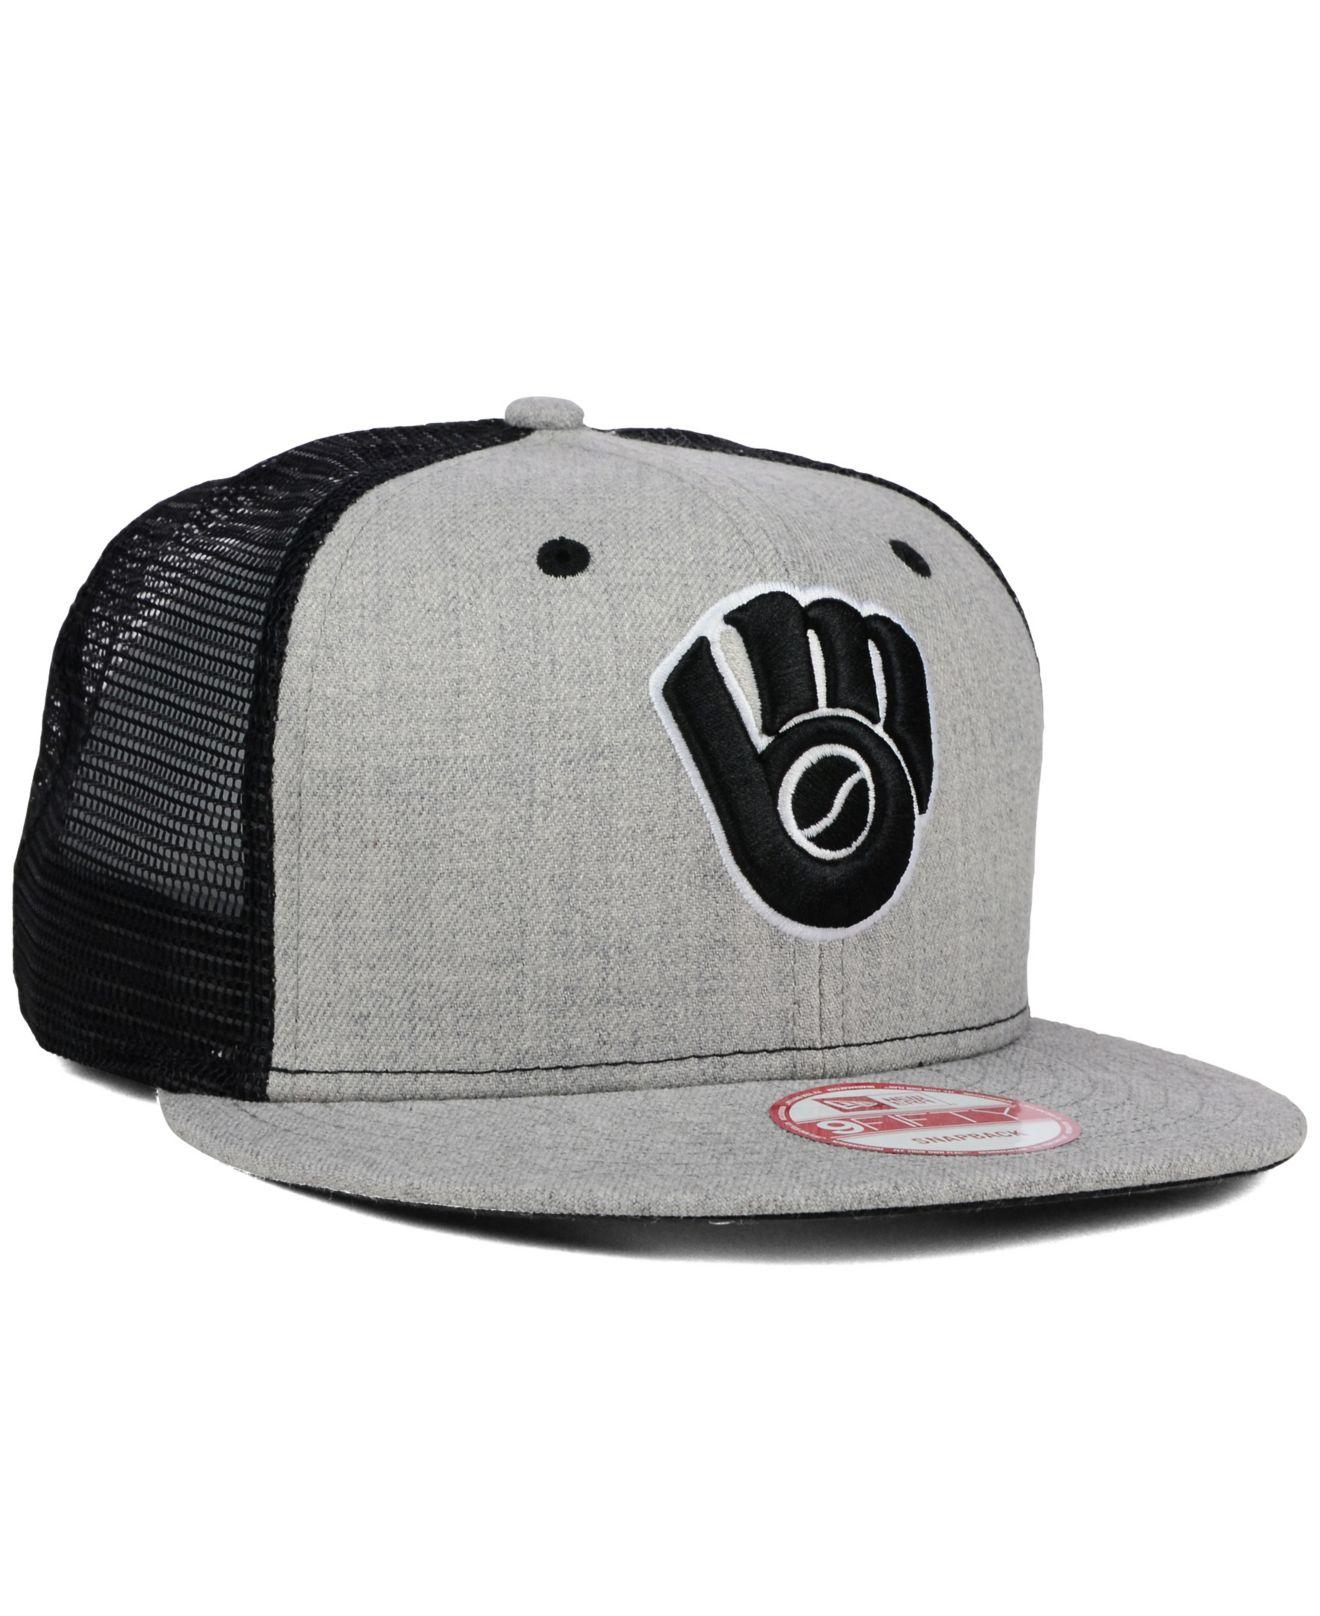 innovative design e3832 d3174 ... coupon lyst ktz milwaukee brewers heather trucker 9fifty snapback cap  in 8aa59 48973